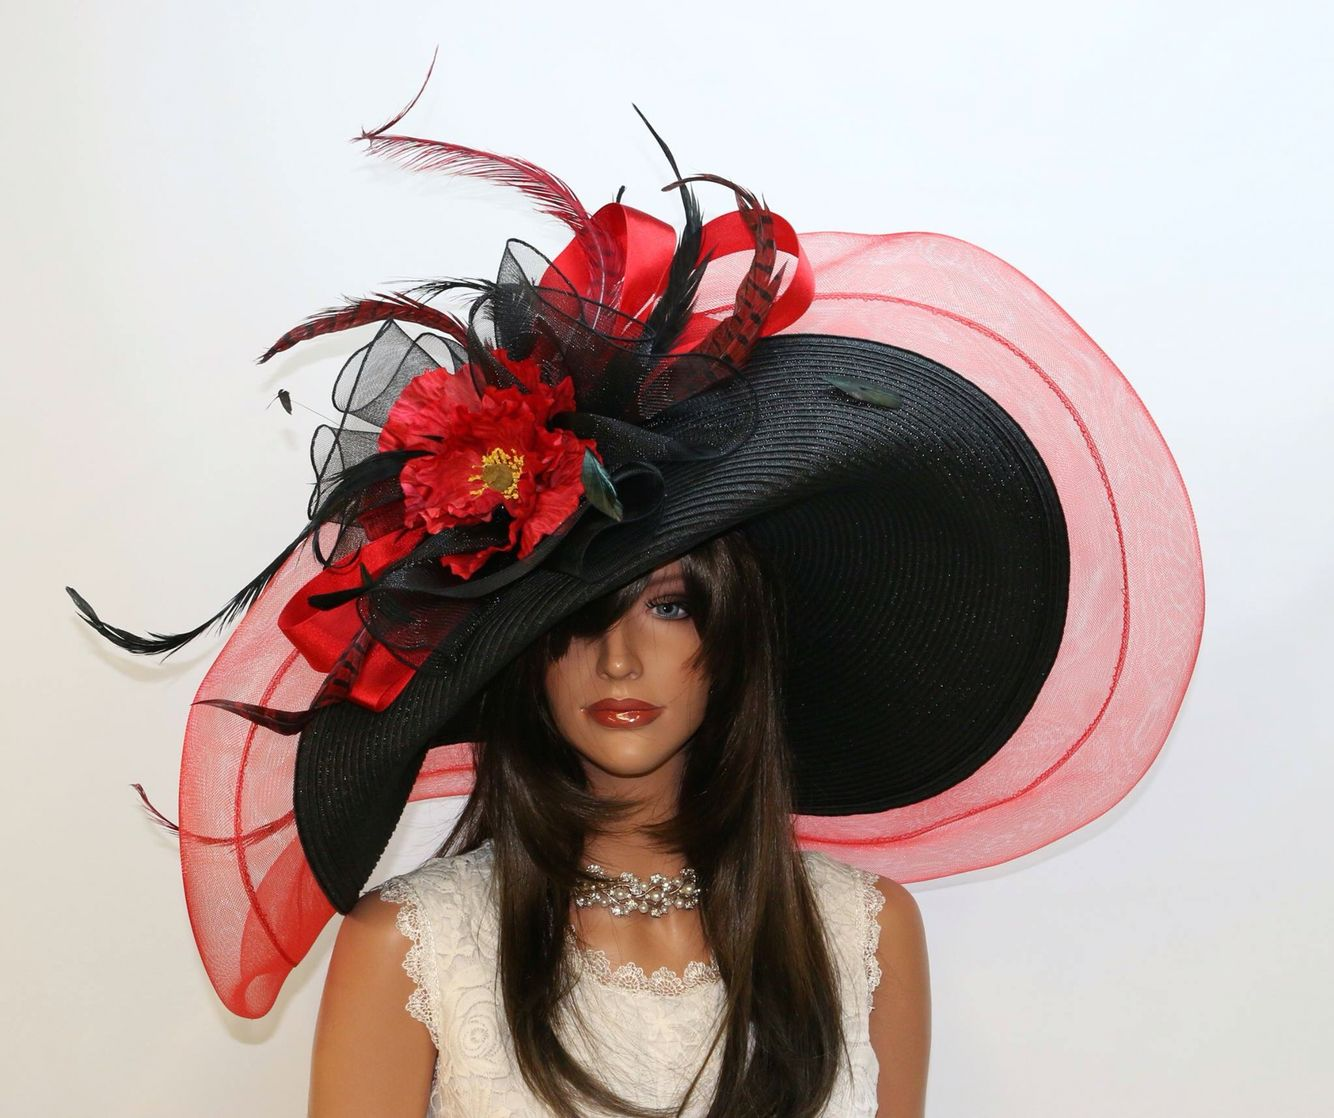 15 Of The Craziest Glamorous Hats: Kentucky Derby Hats By Vinzetta